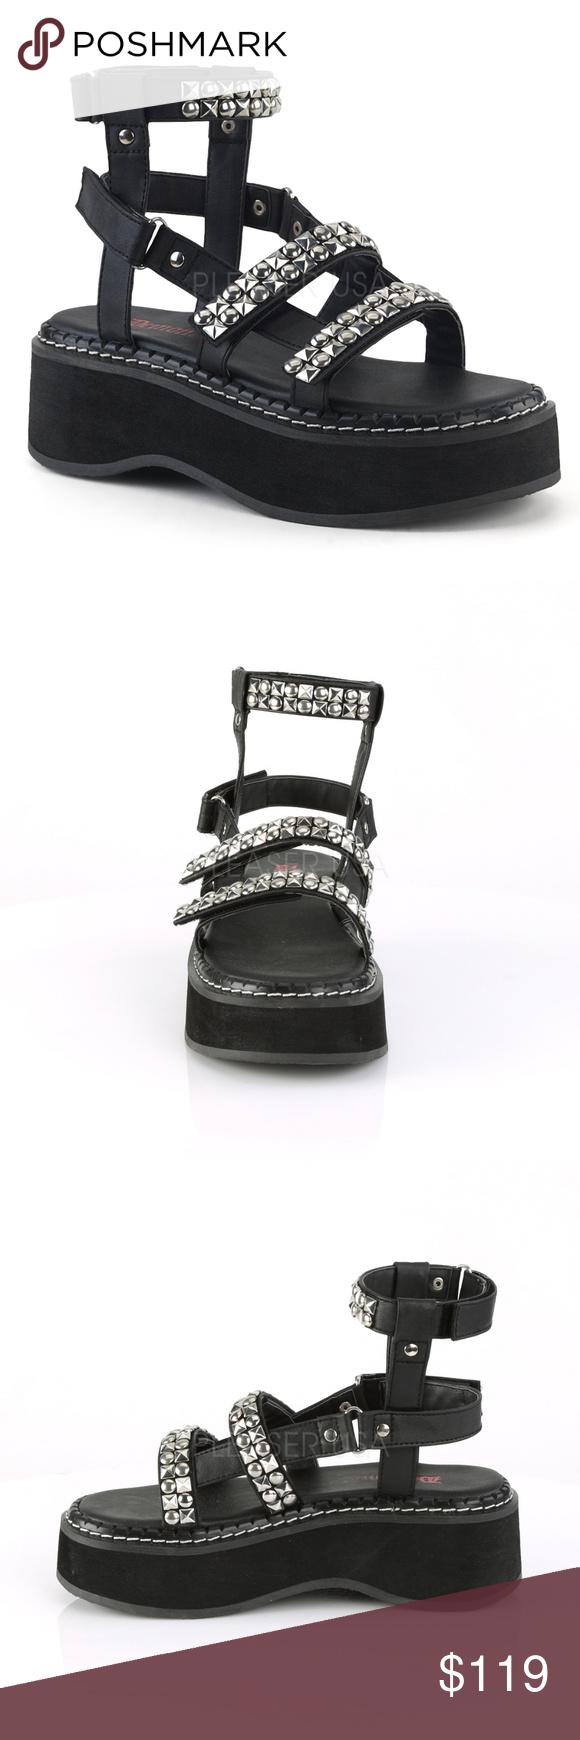 ecf39665852 Gothic Shoes Platform Gladiator Sandals Studded 2